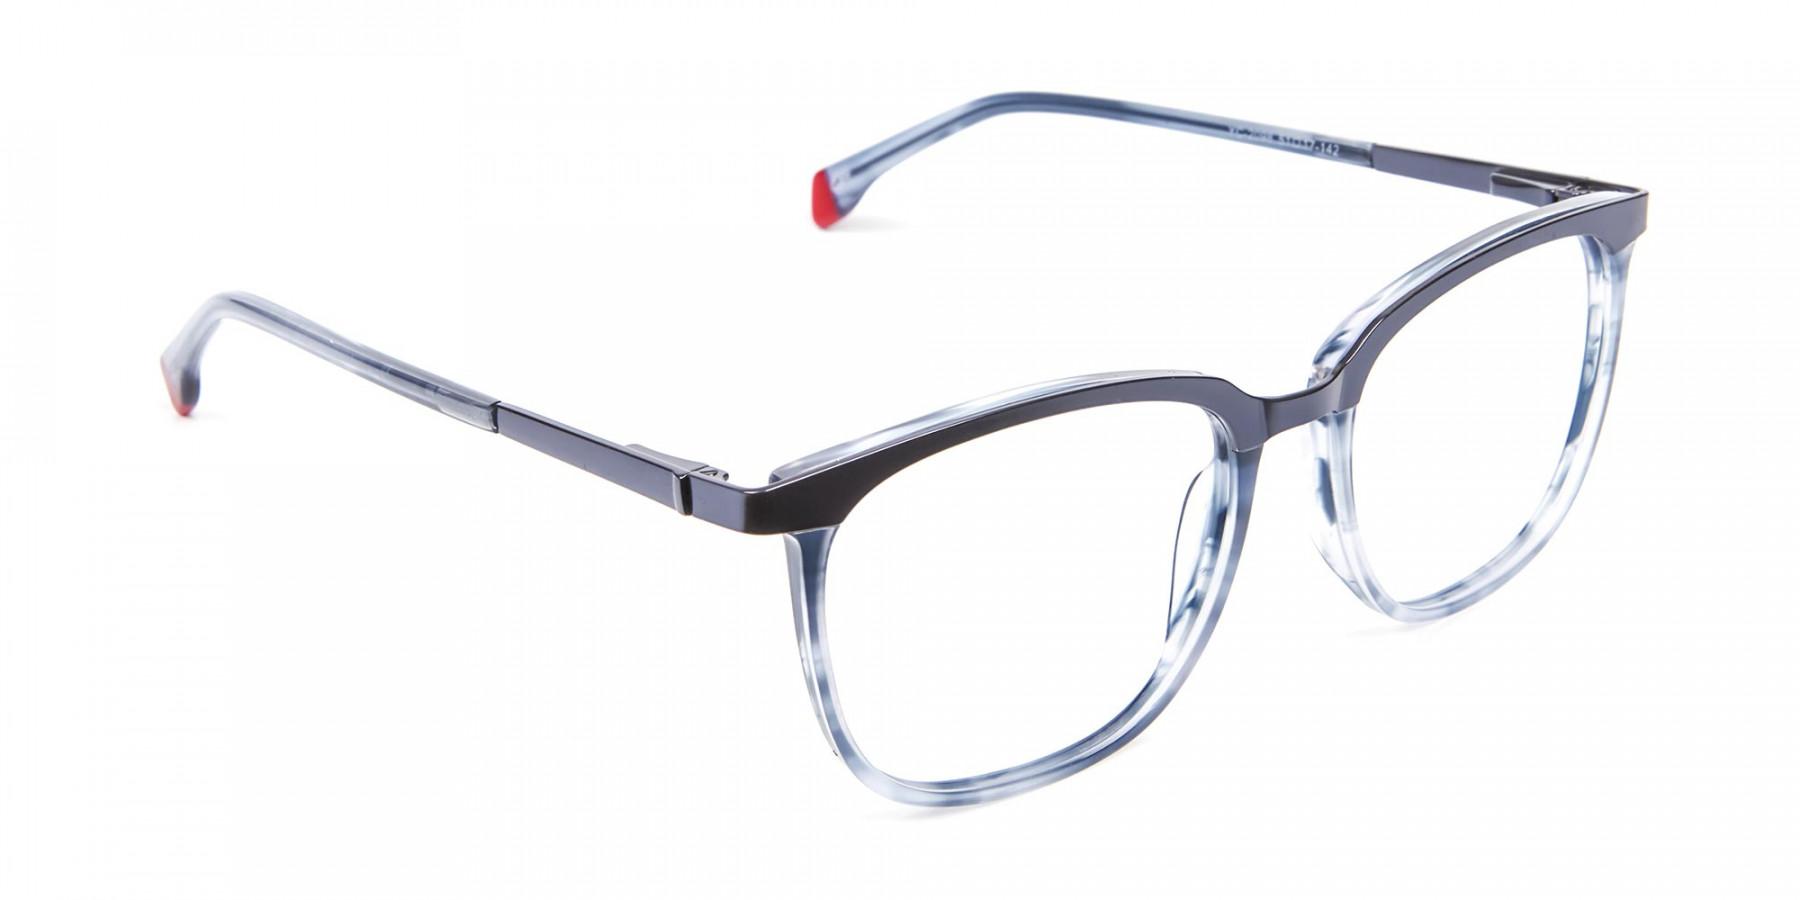 Smoky Blue Framed Glasses